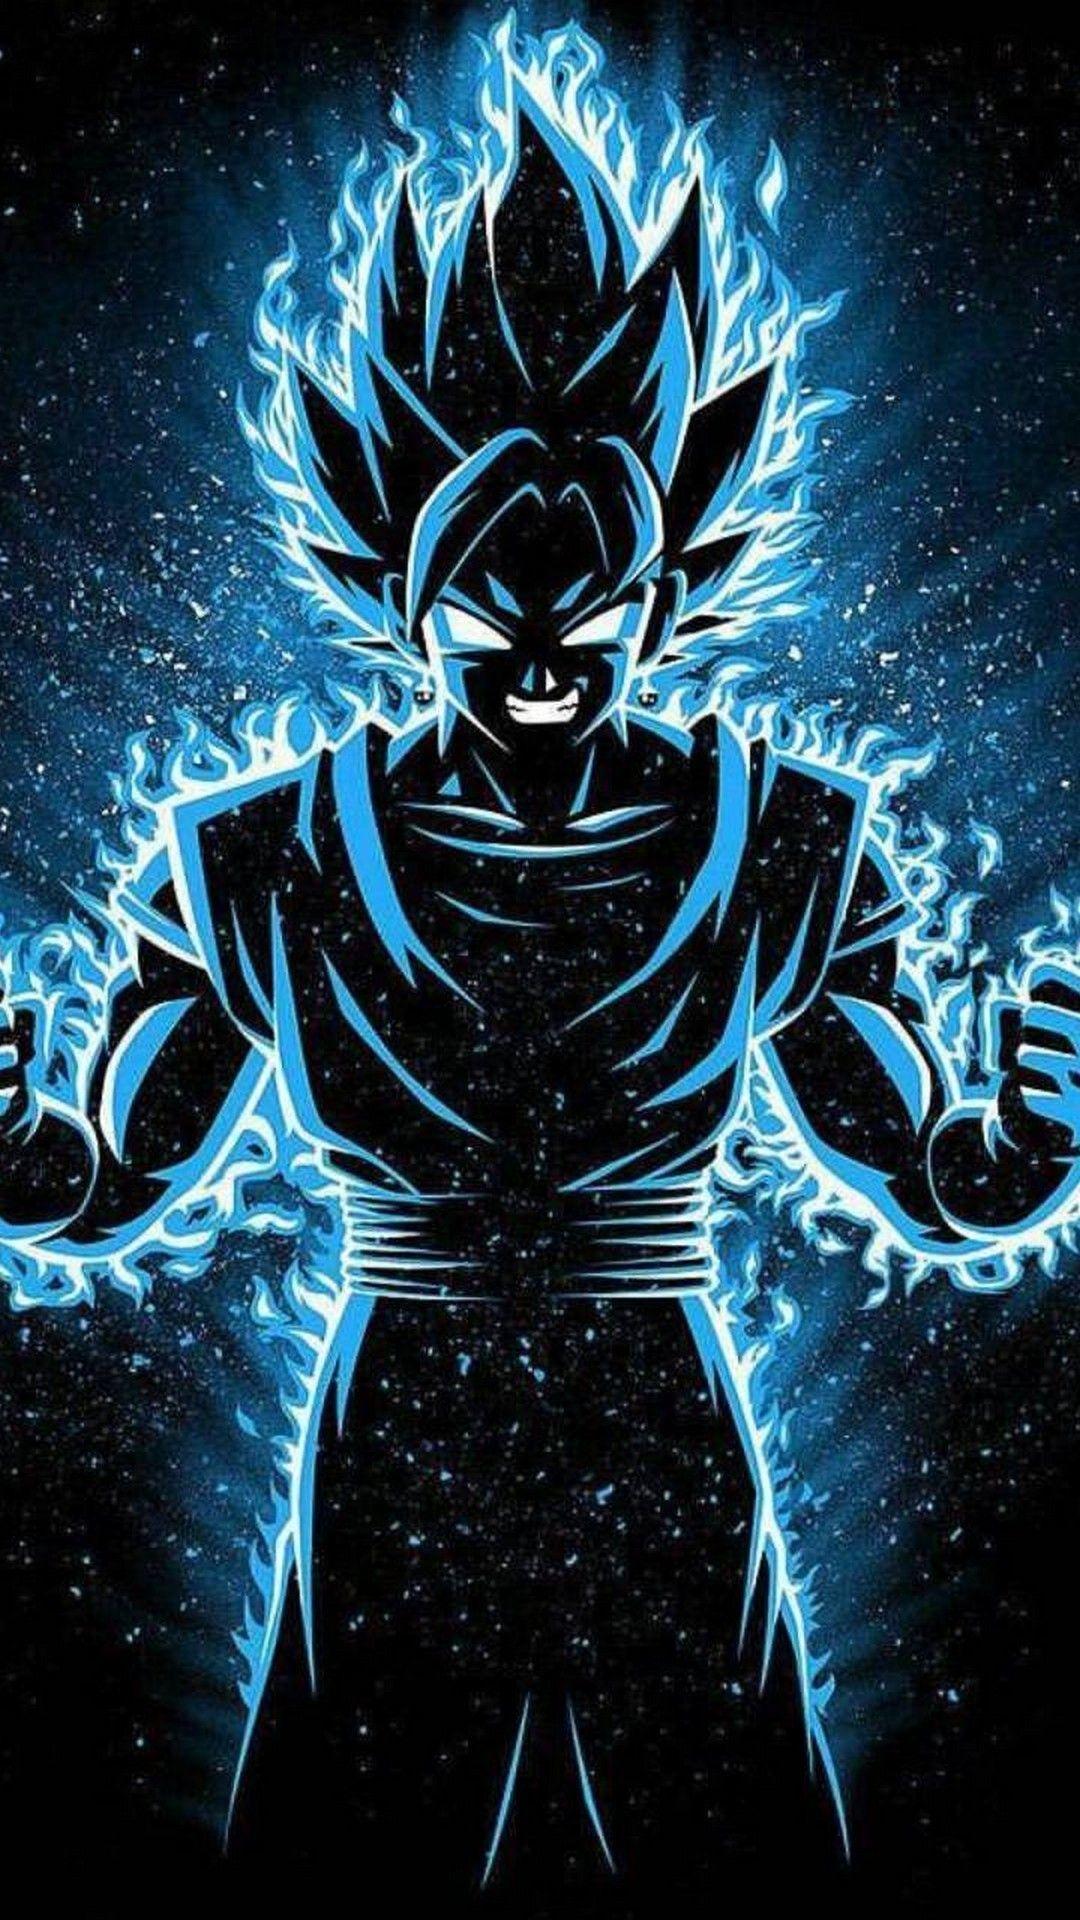 Dragon Ball Z Dark Wallpapers Top Free Dragon Ball Z Dark Backgrounds Wallpaperaccess